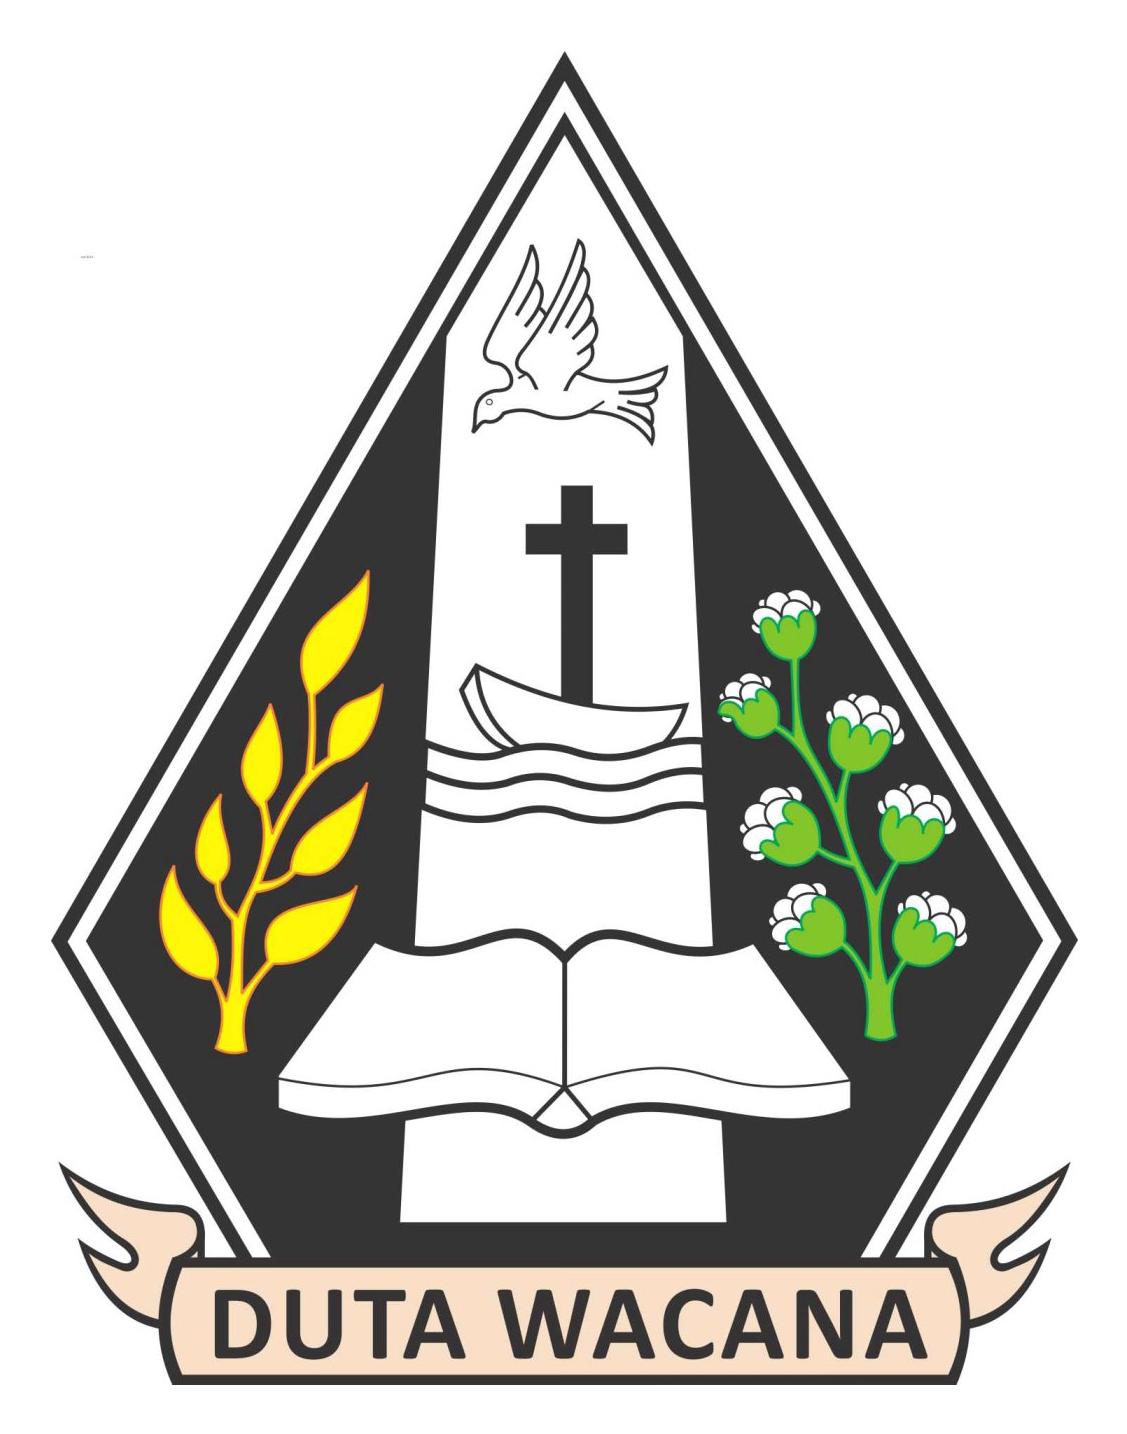 Logo UKDW (Universitas Kristen Duta Wacana) Original